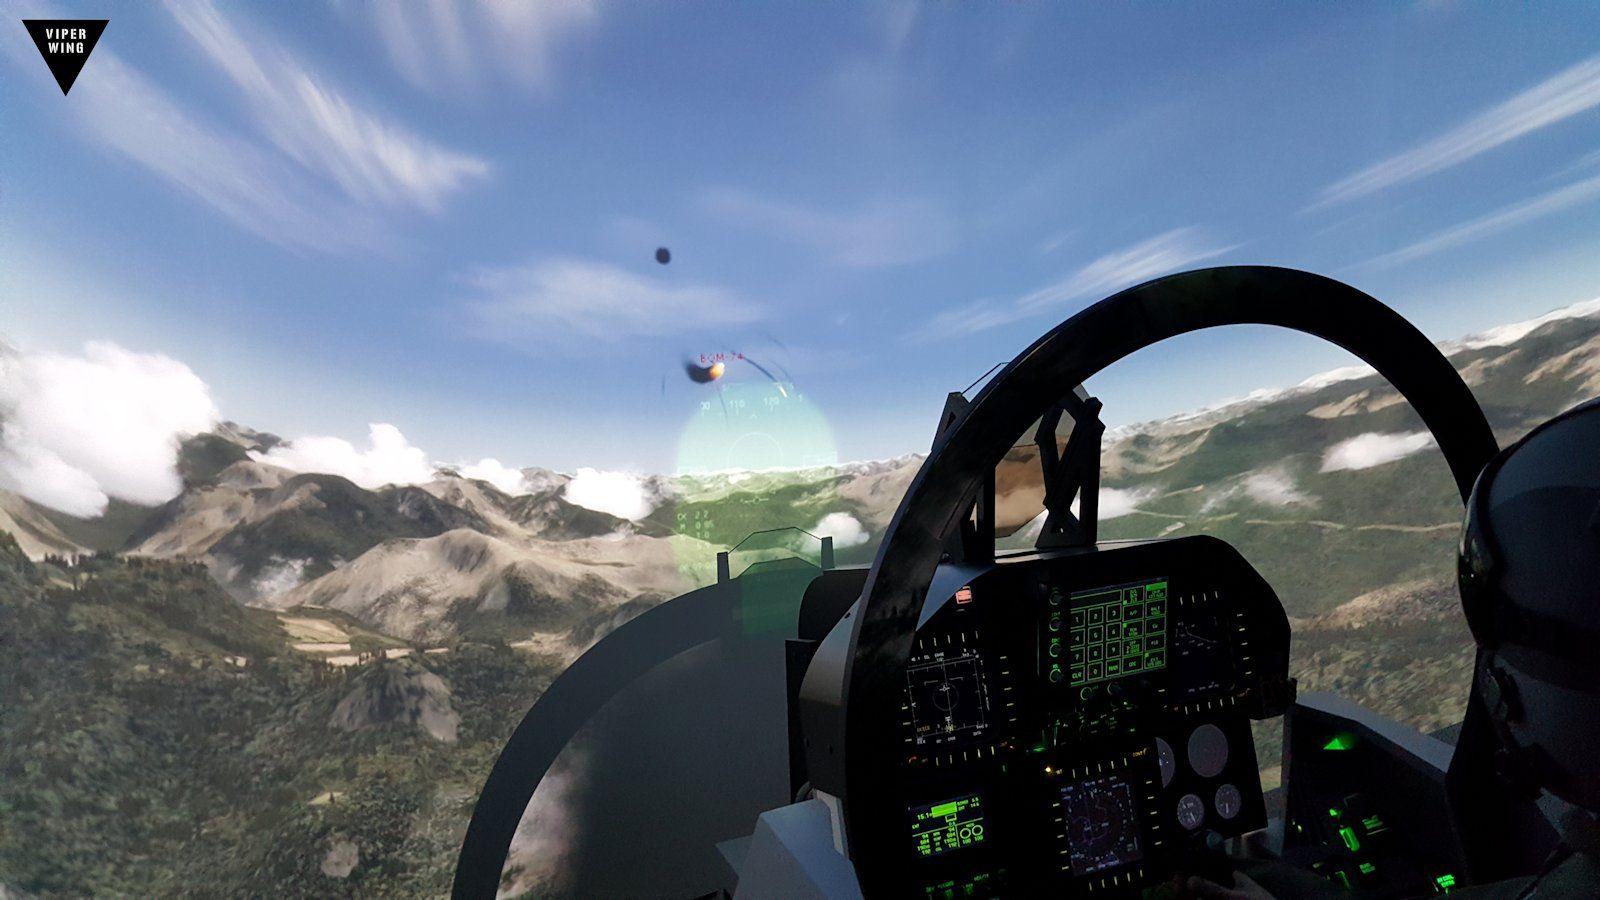 F-18 simulator cockpit, Super Hornet | F-18 simulator ...